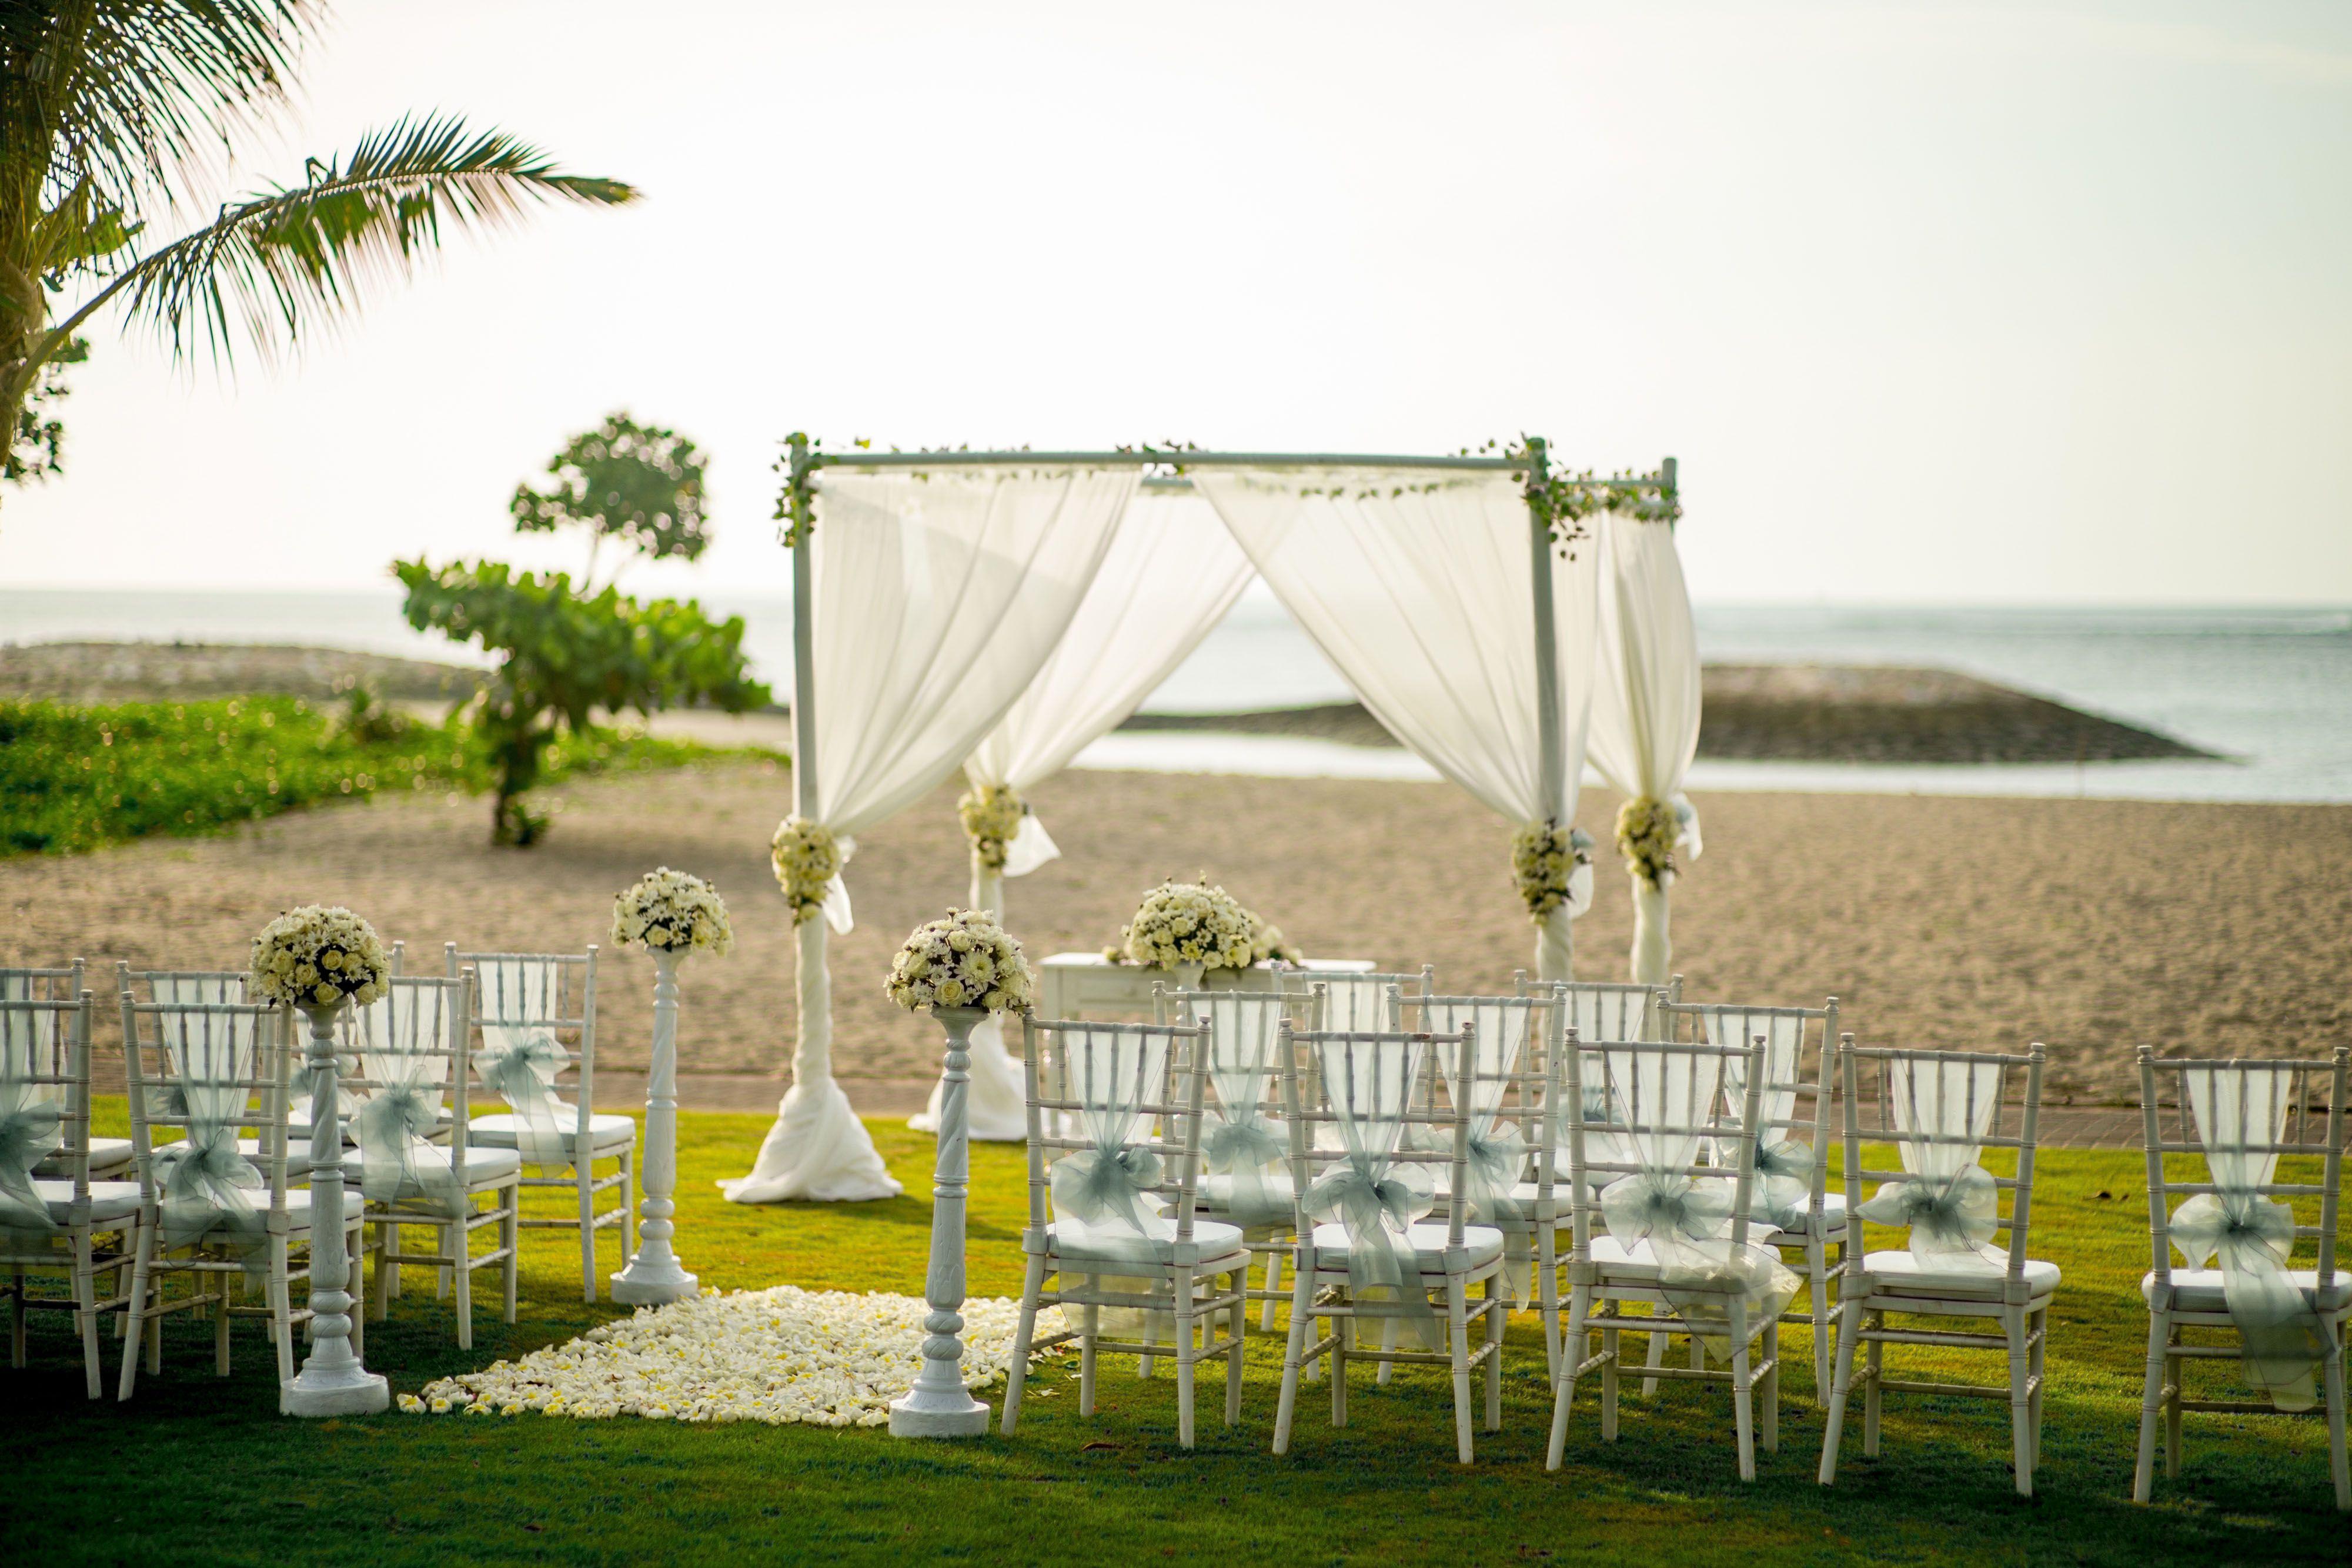 Special Wedding In Holiday Inn Baruna Bali Romantic Wedding Venue Wedding Organizer Planner Inexpensive Wedding Invitations